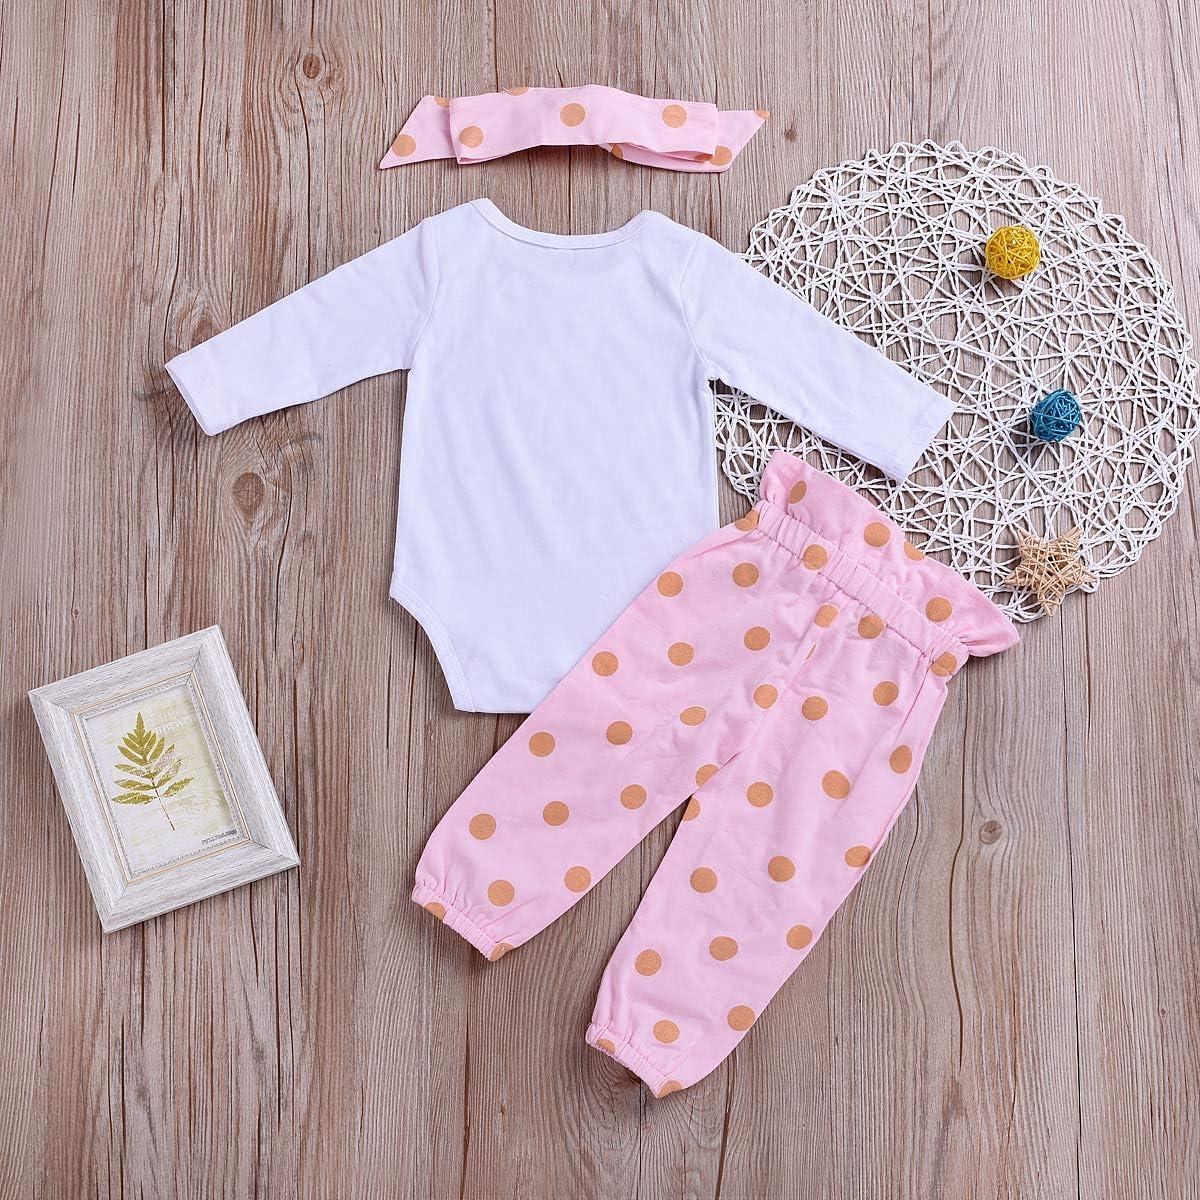 3Pcs Newborn Baby Girl Shorts Outfit Clothes Rainbow Romper+Ruffles Short+Headband